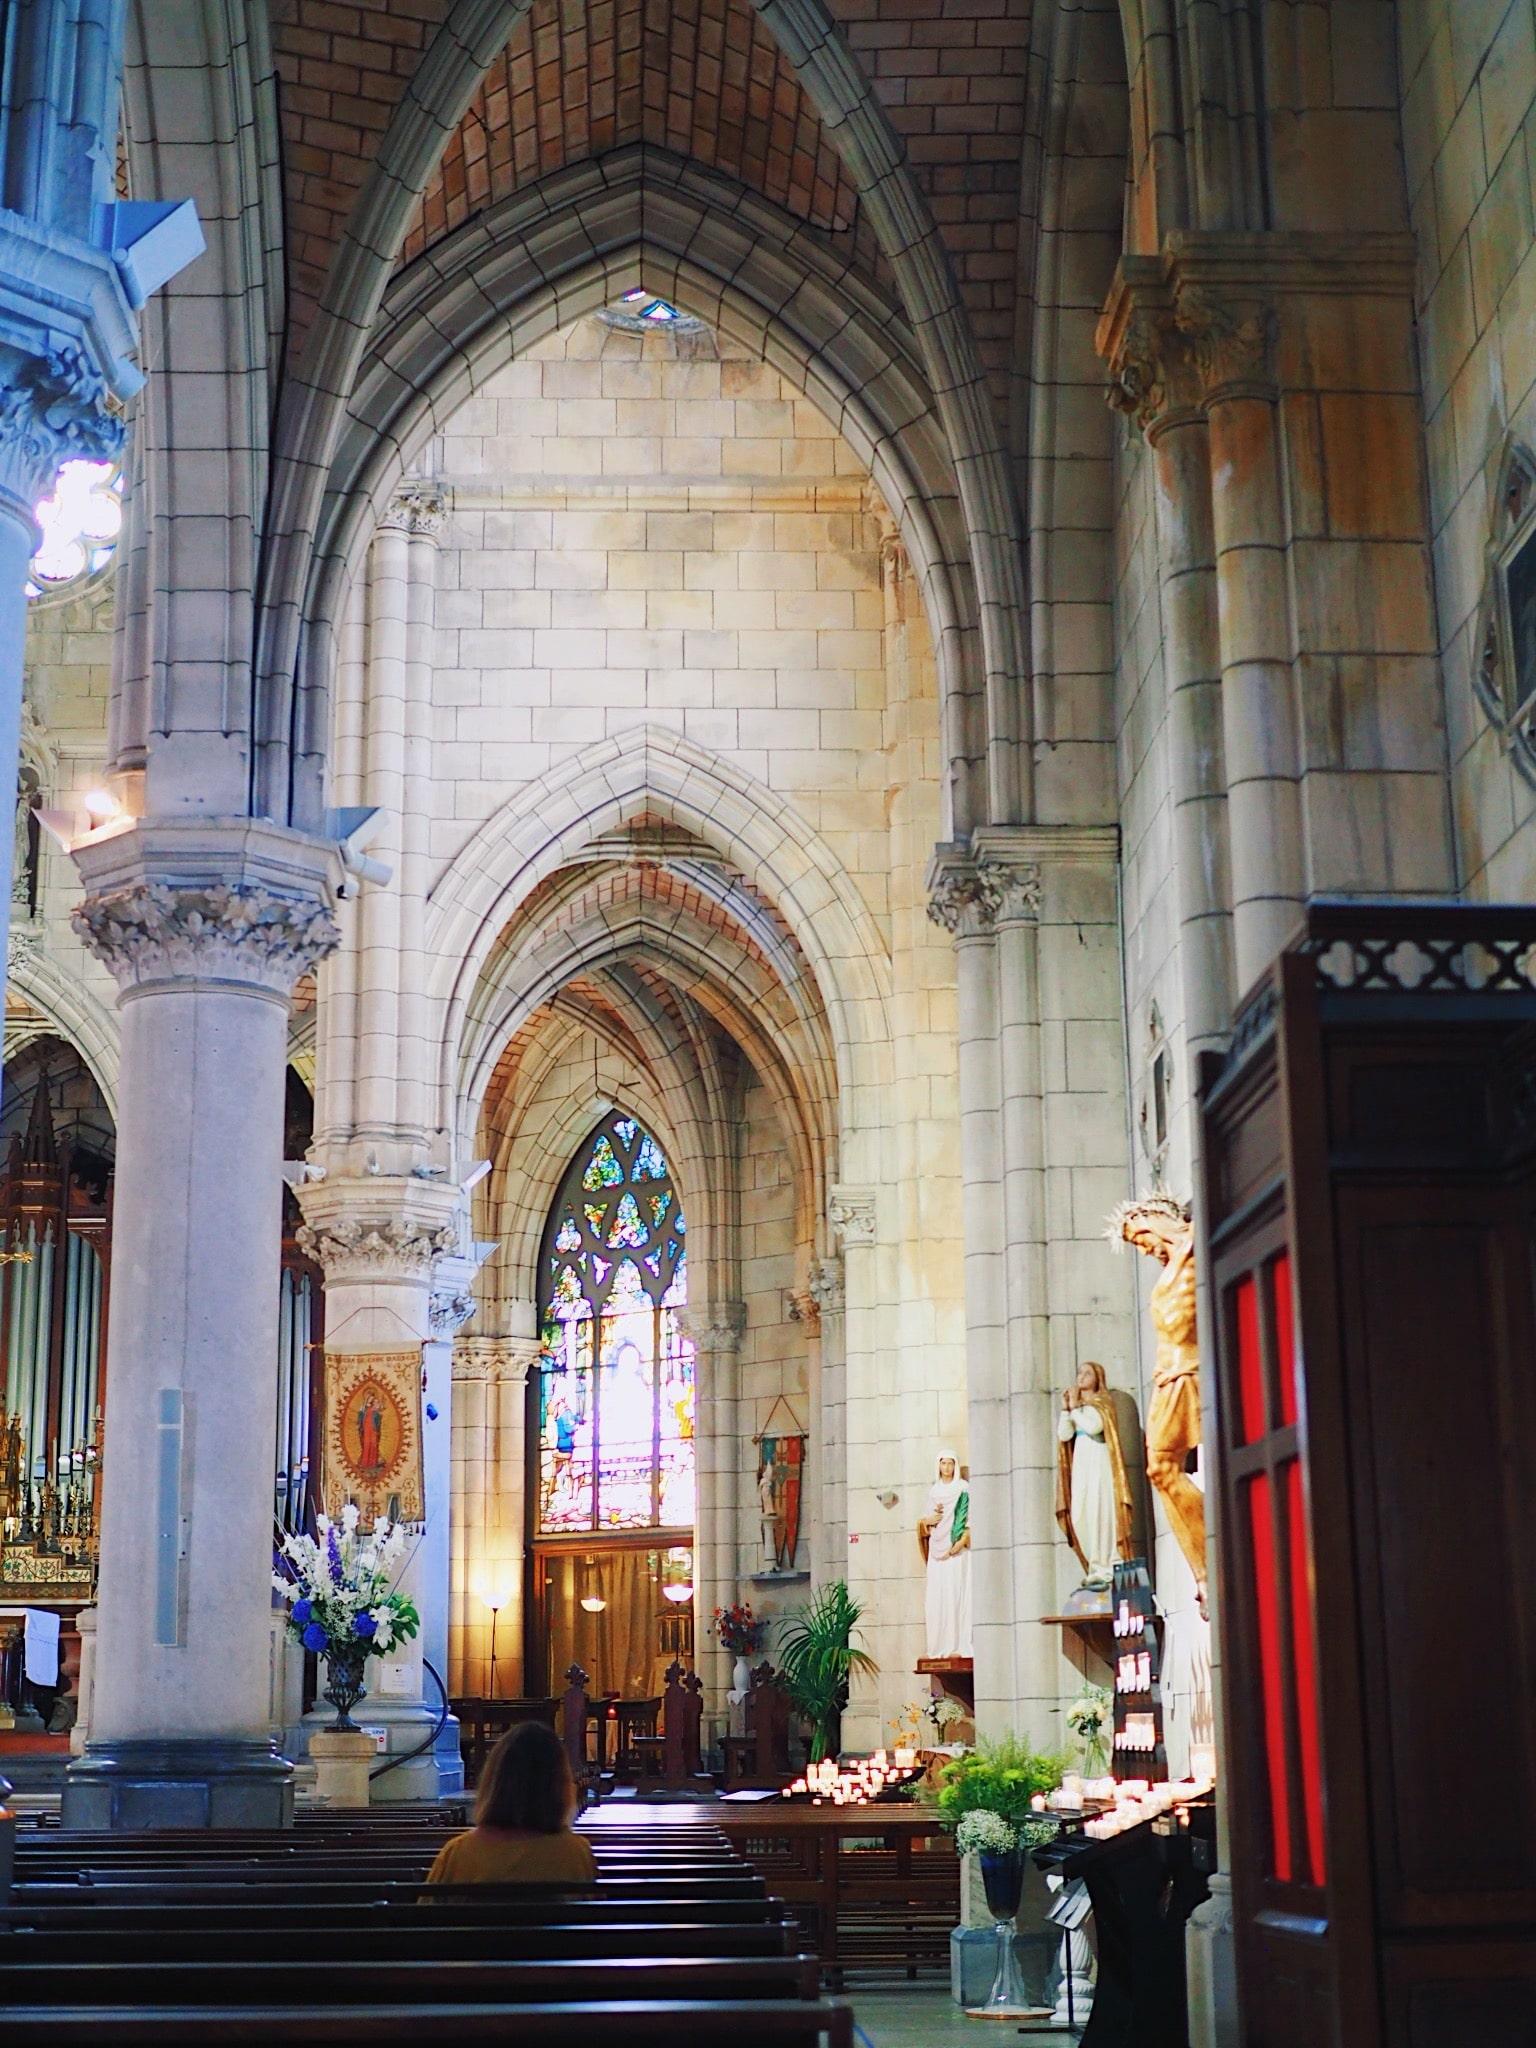 visiter-cathédrale-bayonne